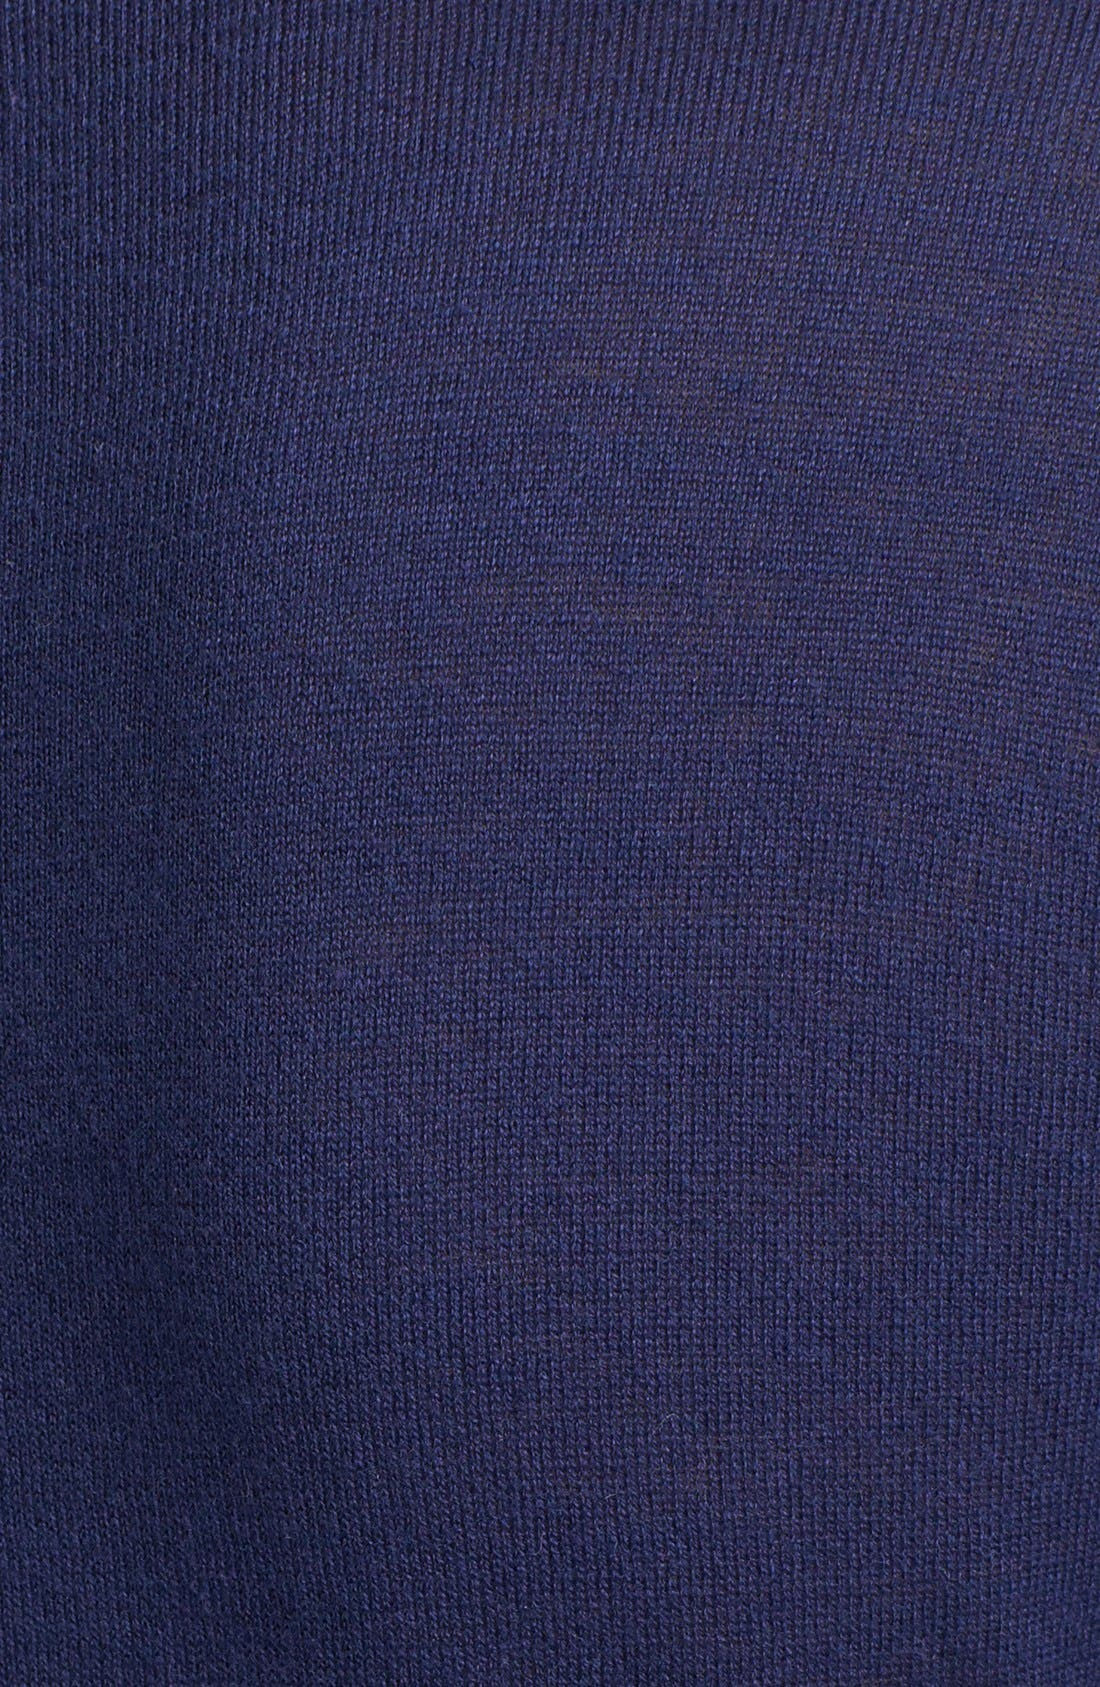 Alternate Image 3  - Halogen® Crewneck Sweater